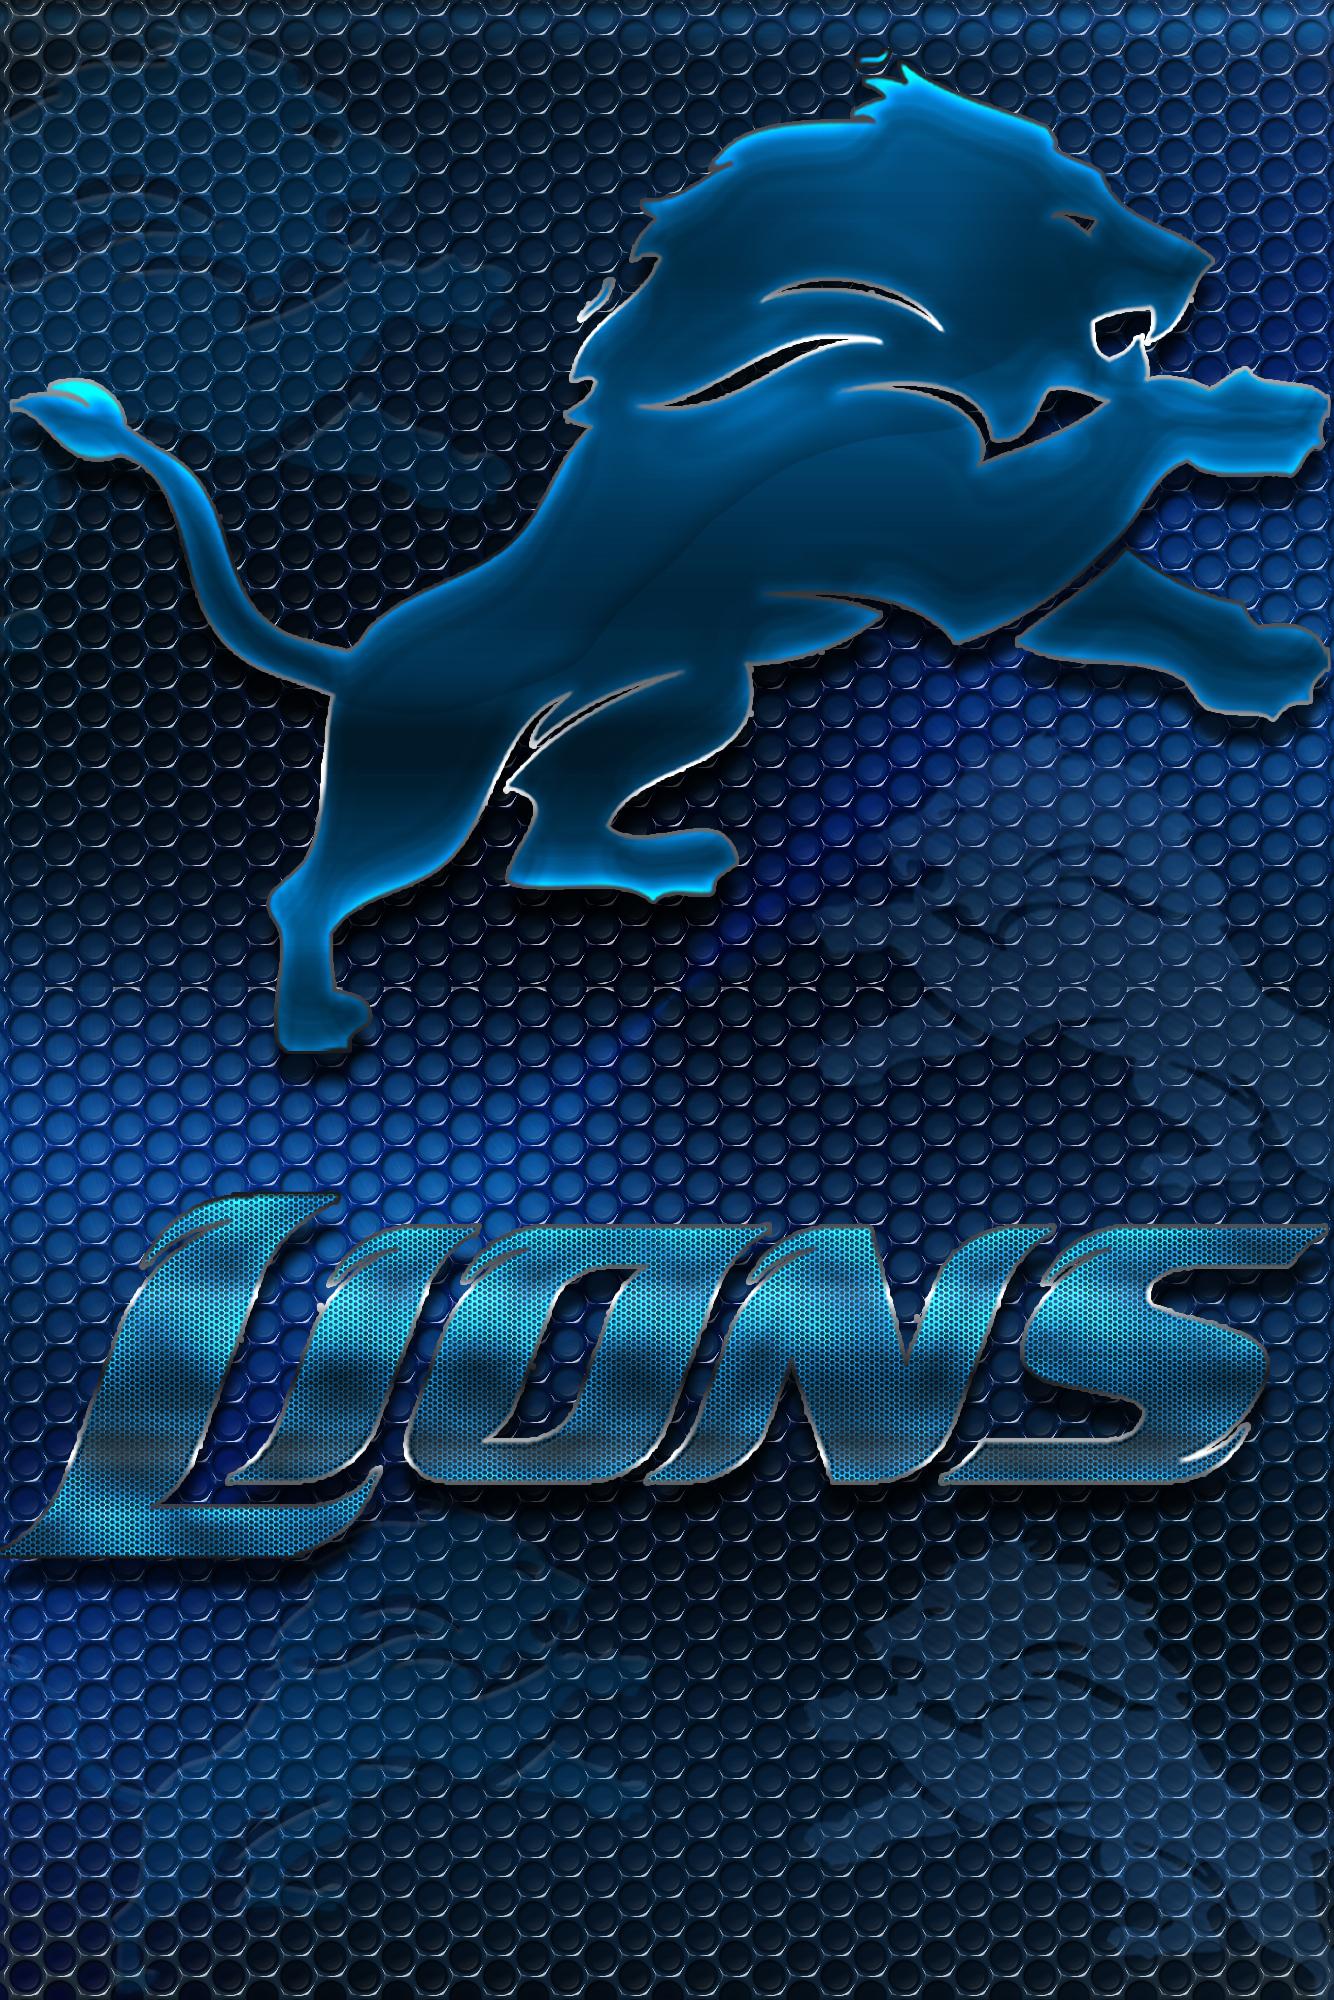 Detroit Lions 2012 Heavy Metal Wallpaper Download Wallpaper 1334x2000